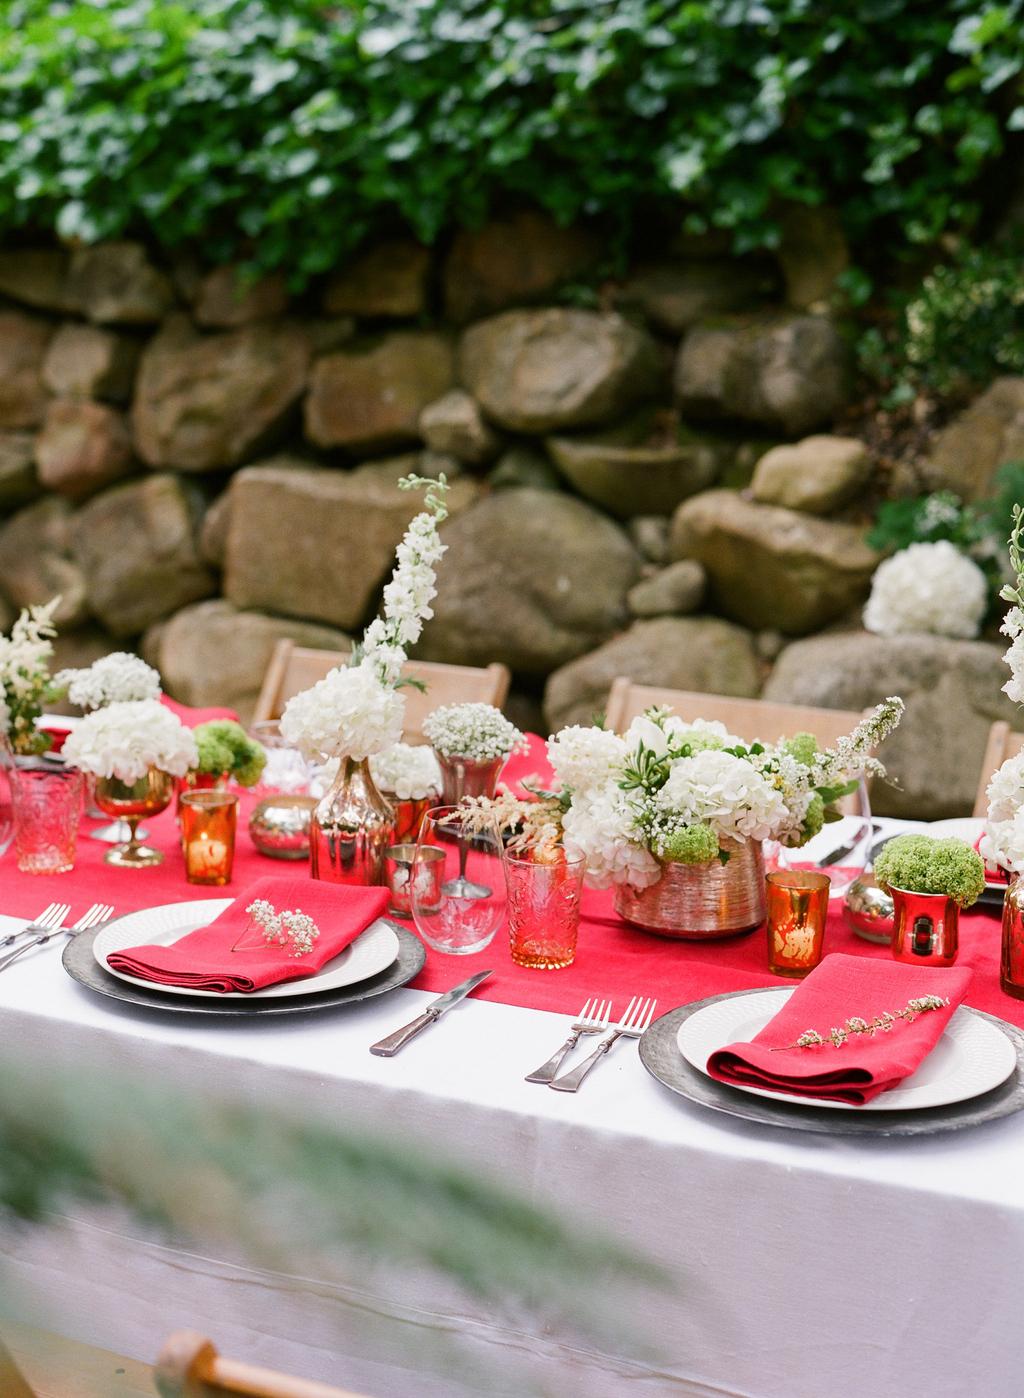 Styled-wedding-santa-barbara-chic-beaux-arts-photographie-italian-bohemian-wedding-venue-table-setting-red-white-flowers-antique-glass-102.full